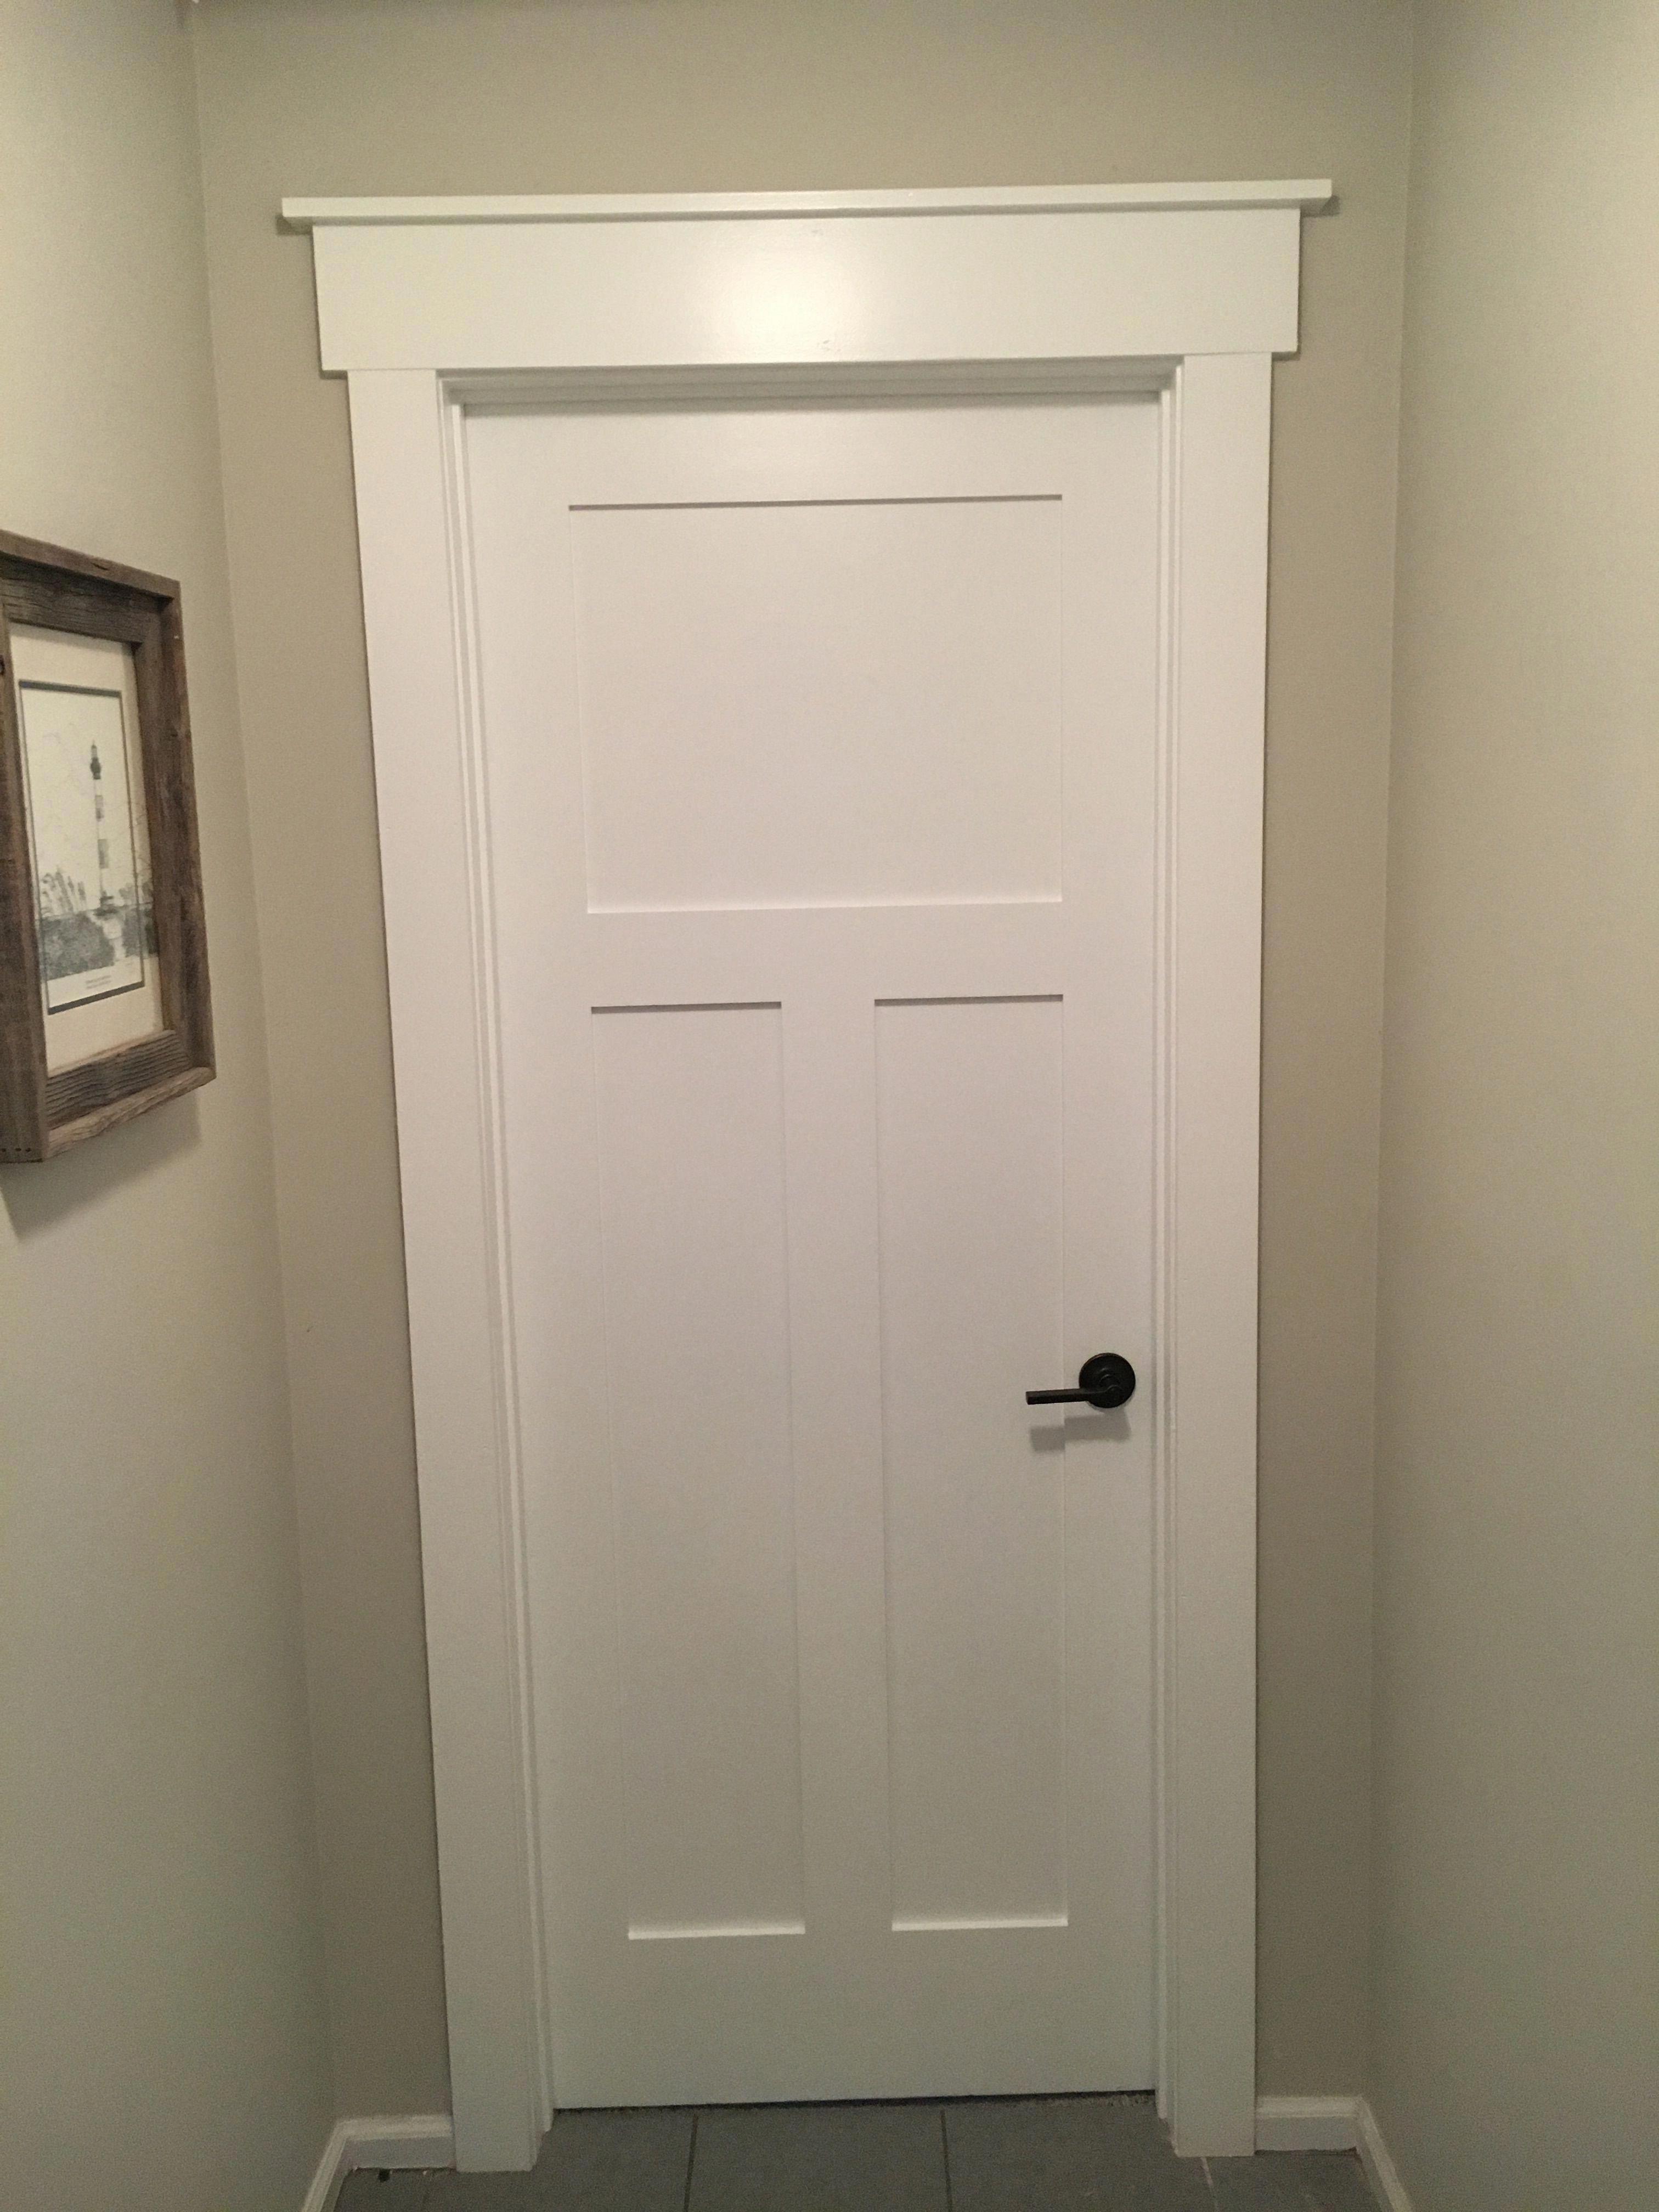 15 Attractive Innovations For Interiorbarndoorsforclosets Interior Door Trim Interior Barn Doors Doors Interior